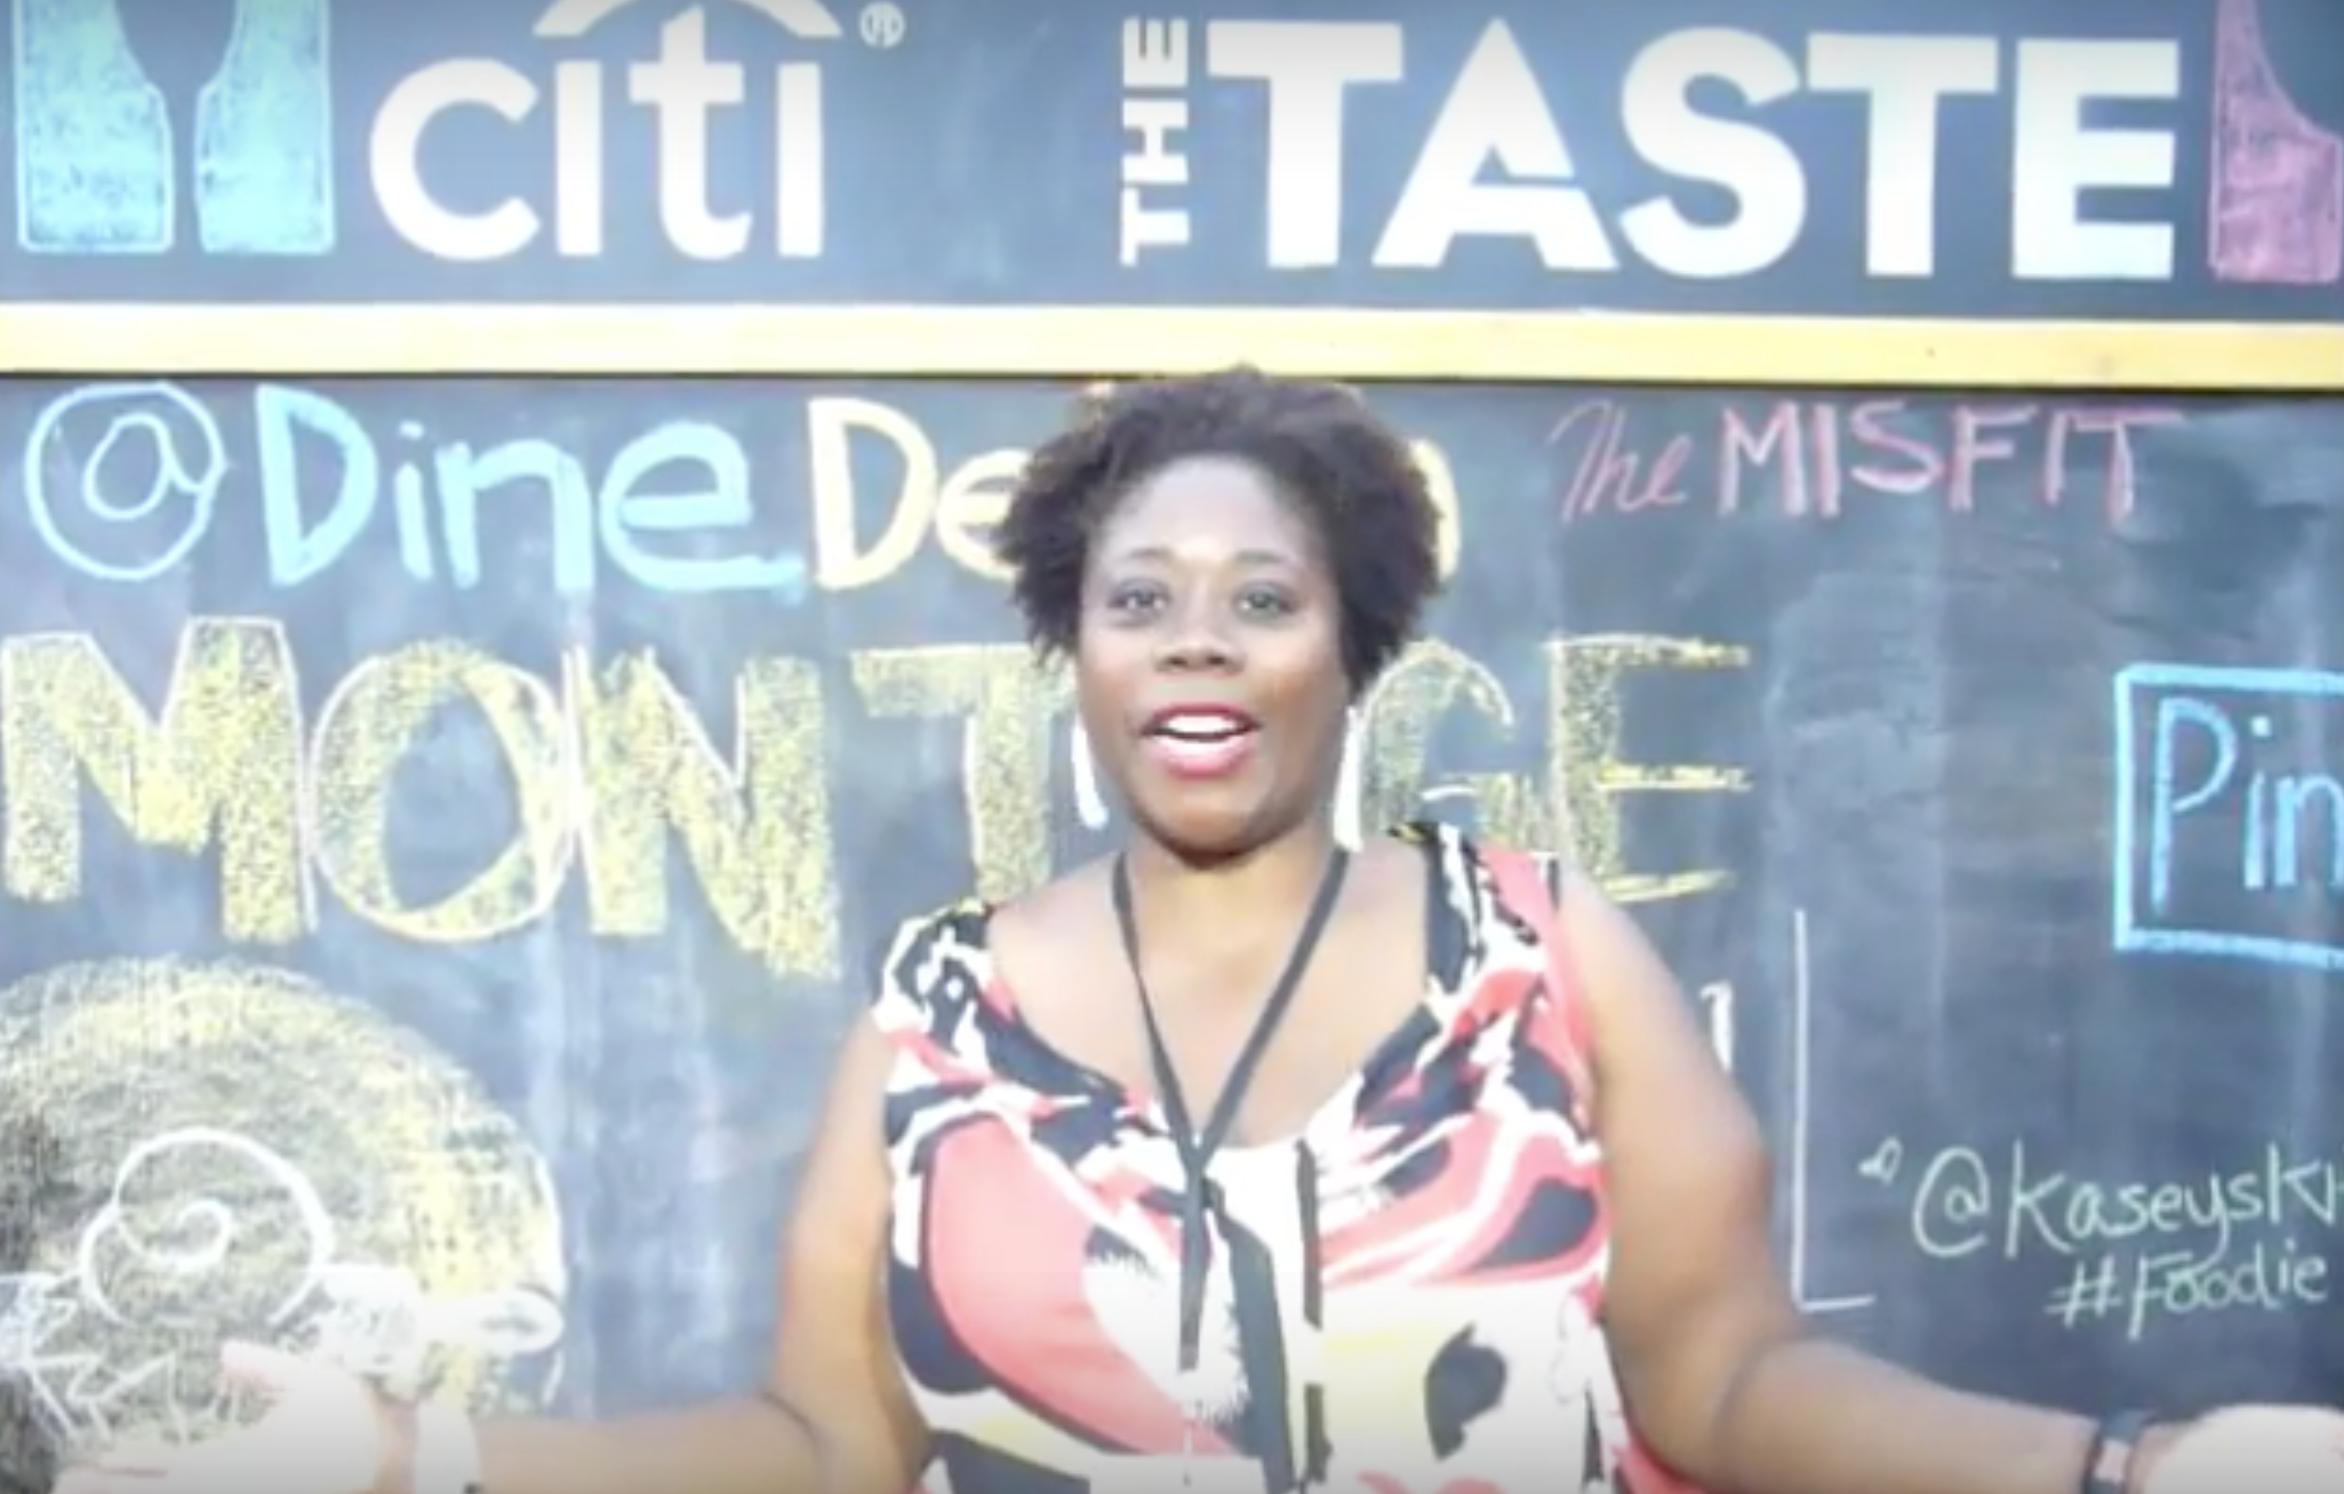 Having fun at the Los Angeles the Taste 2014